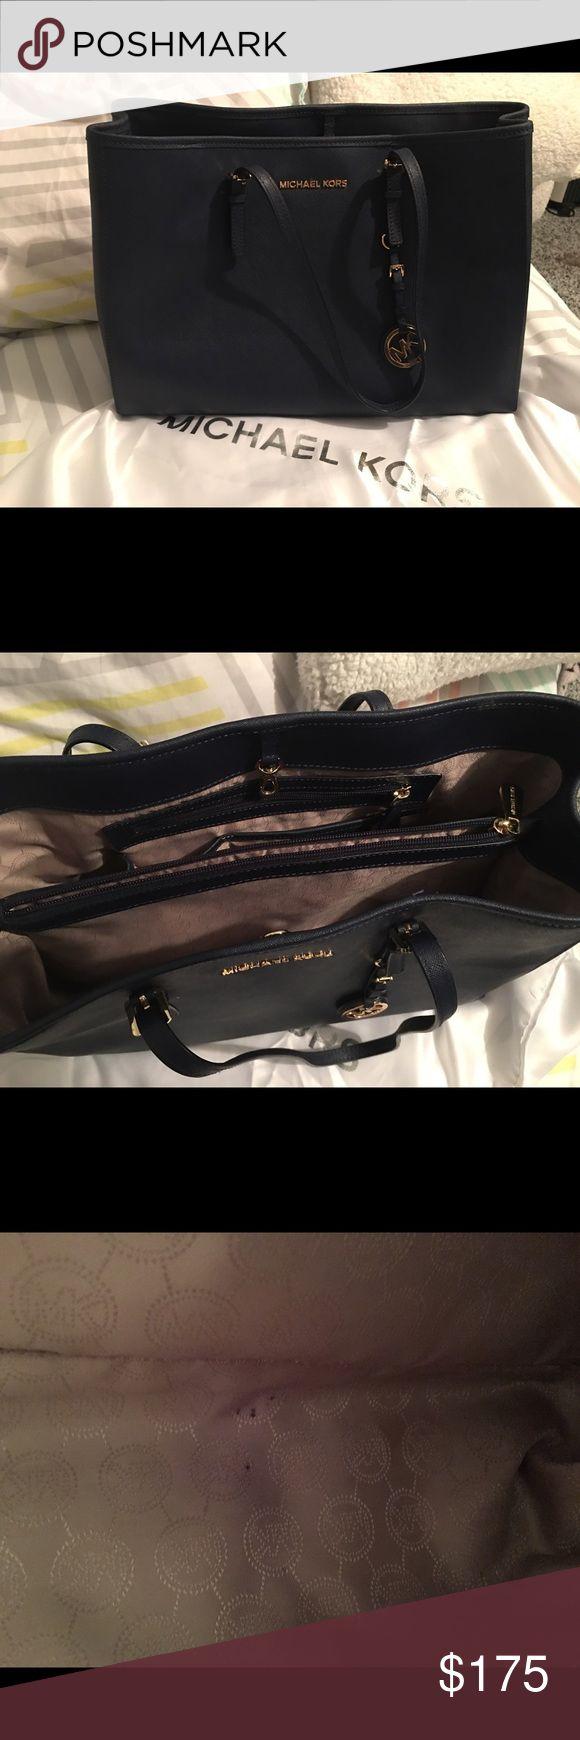 Michael Kors purse Dark navy blue Michael Kors bag gold hardware. As seen in pic 3 very microscopic pen stains. Michael Kors Bags Satchels